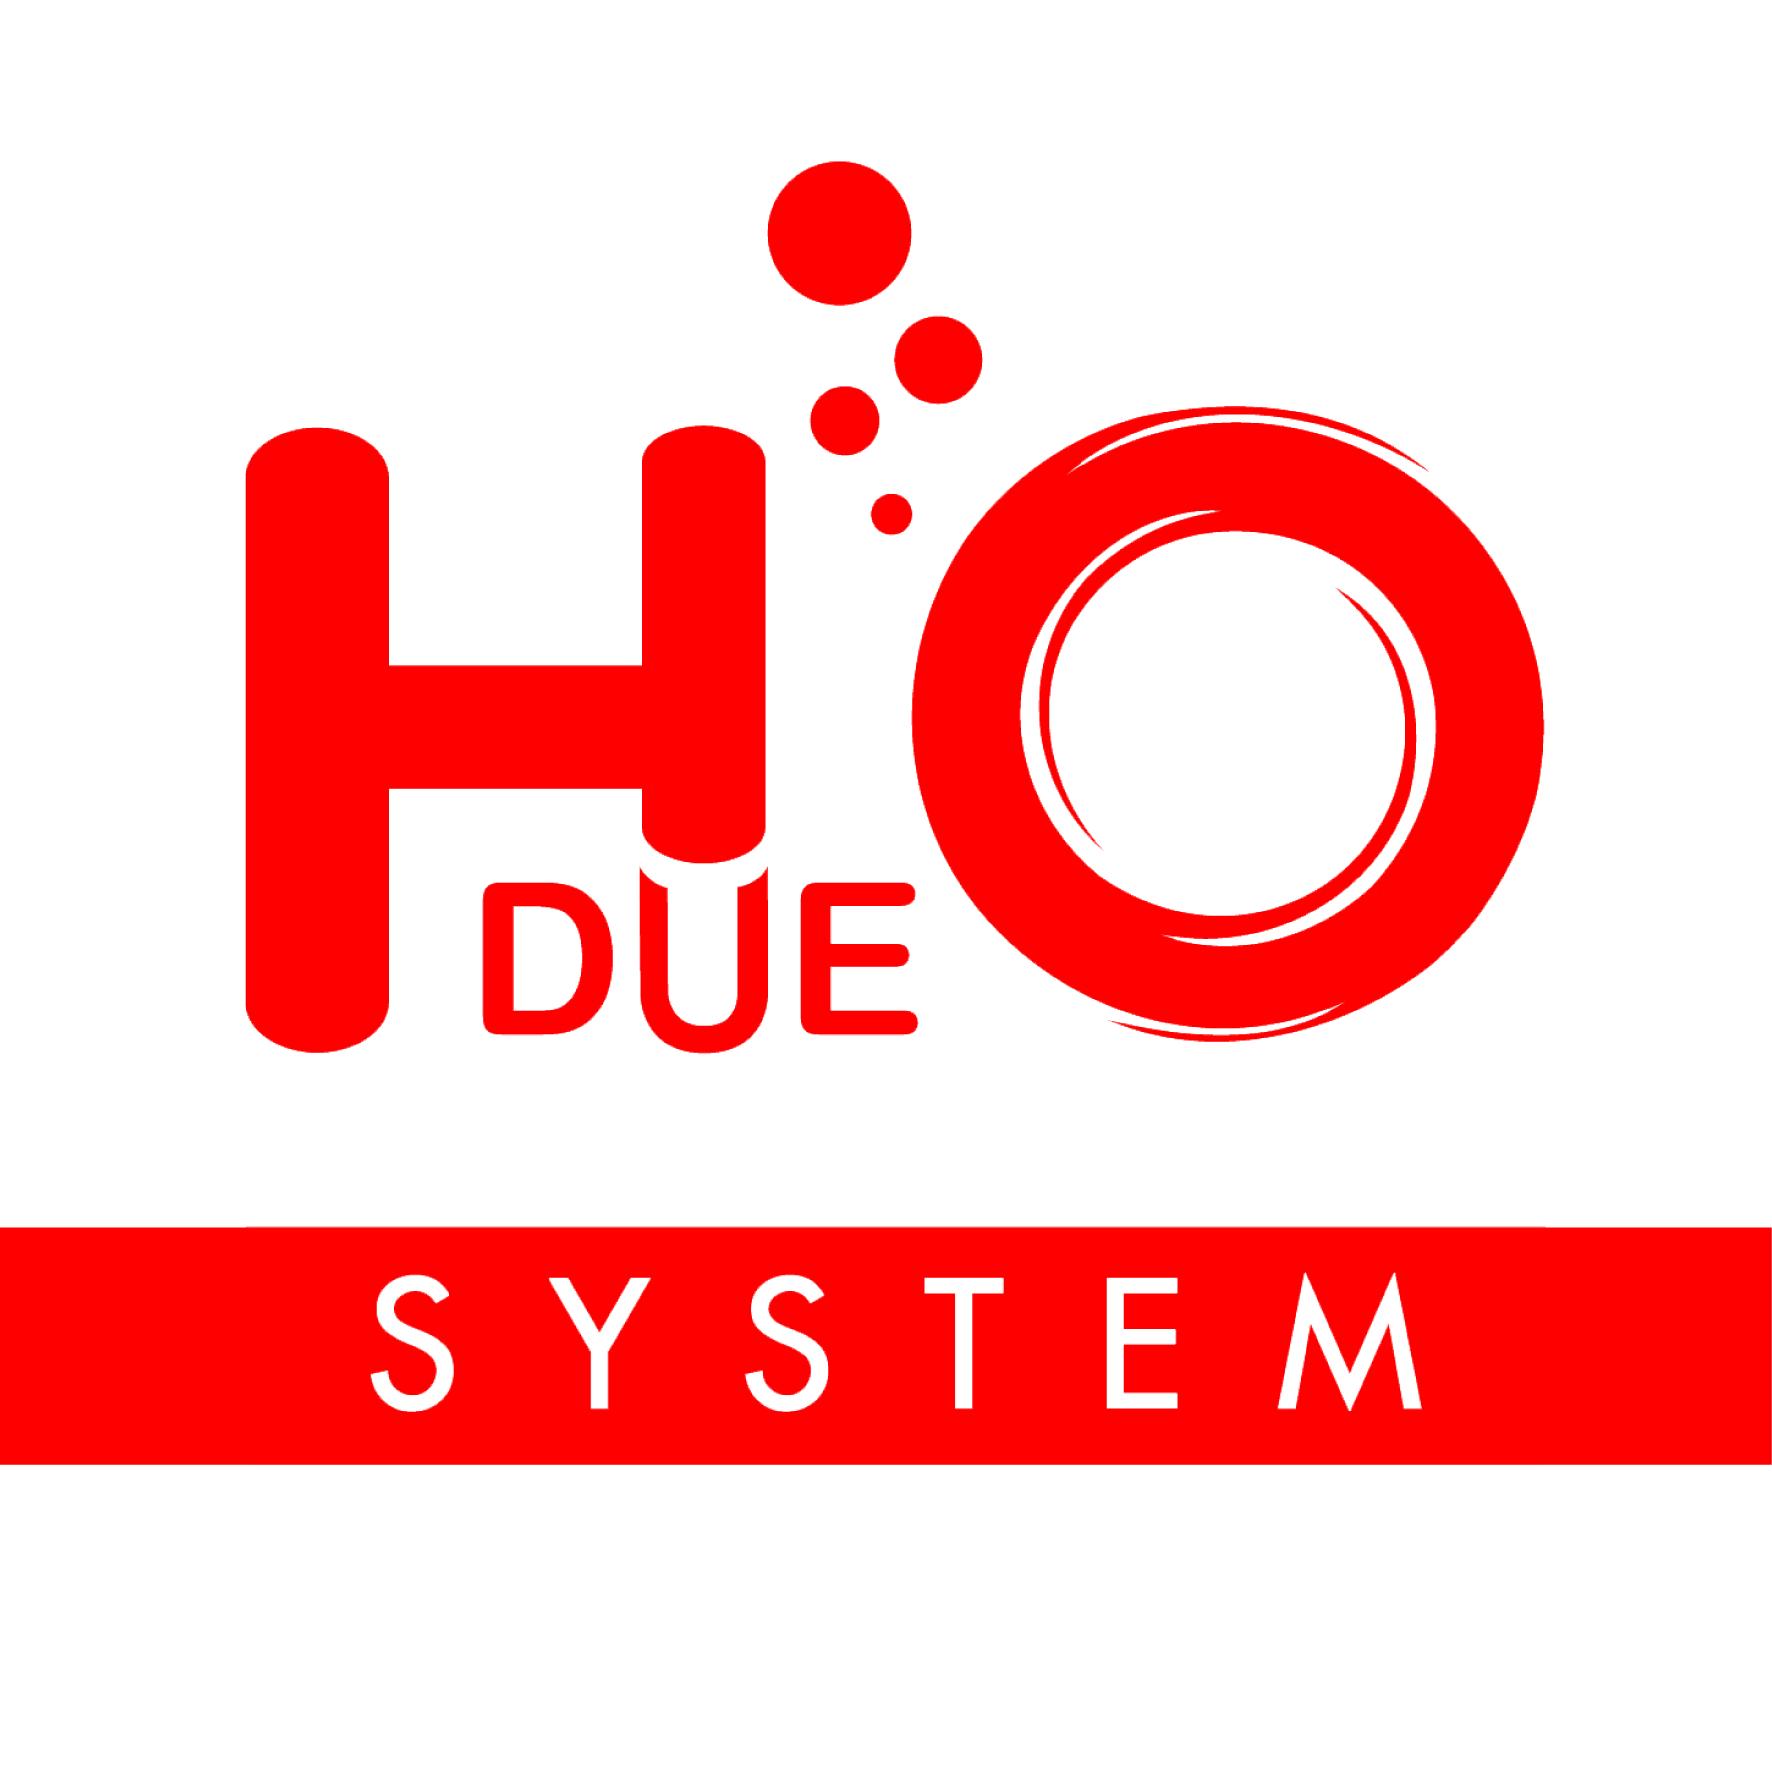 HDUEO SYSTEM